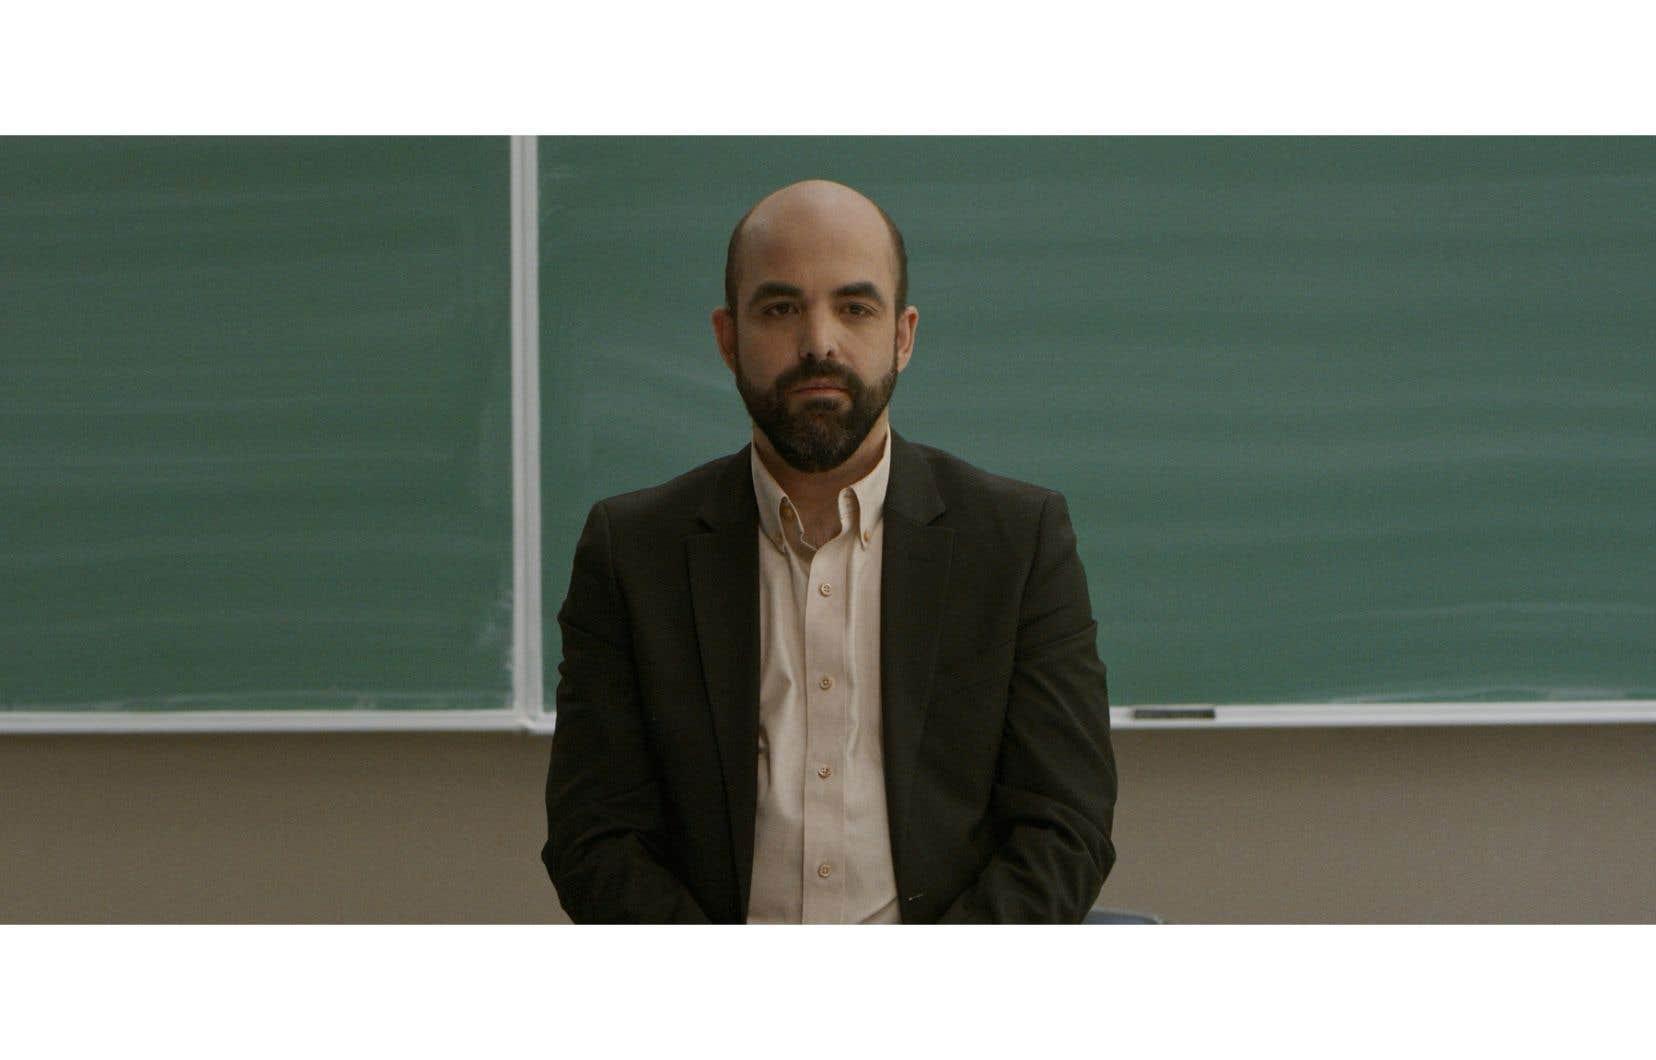 Sylvio Arriola, fragile et solennel, incarne un professeur de philosophie.